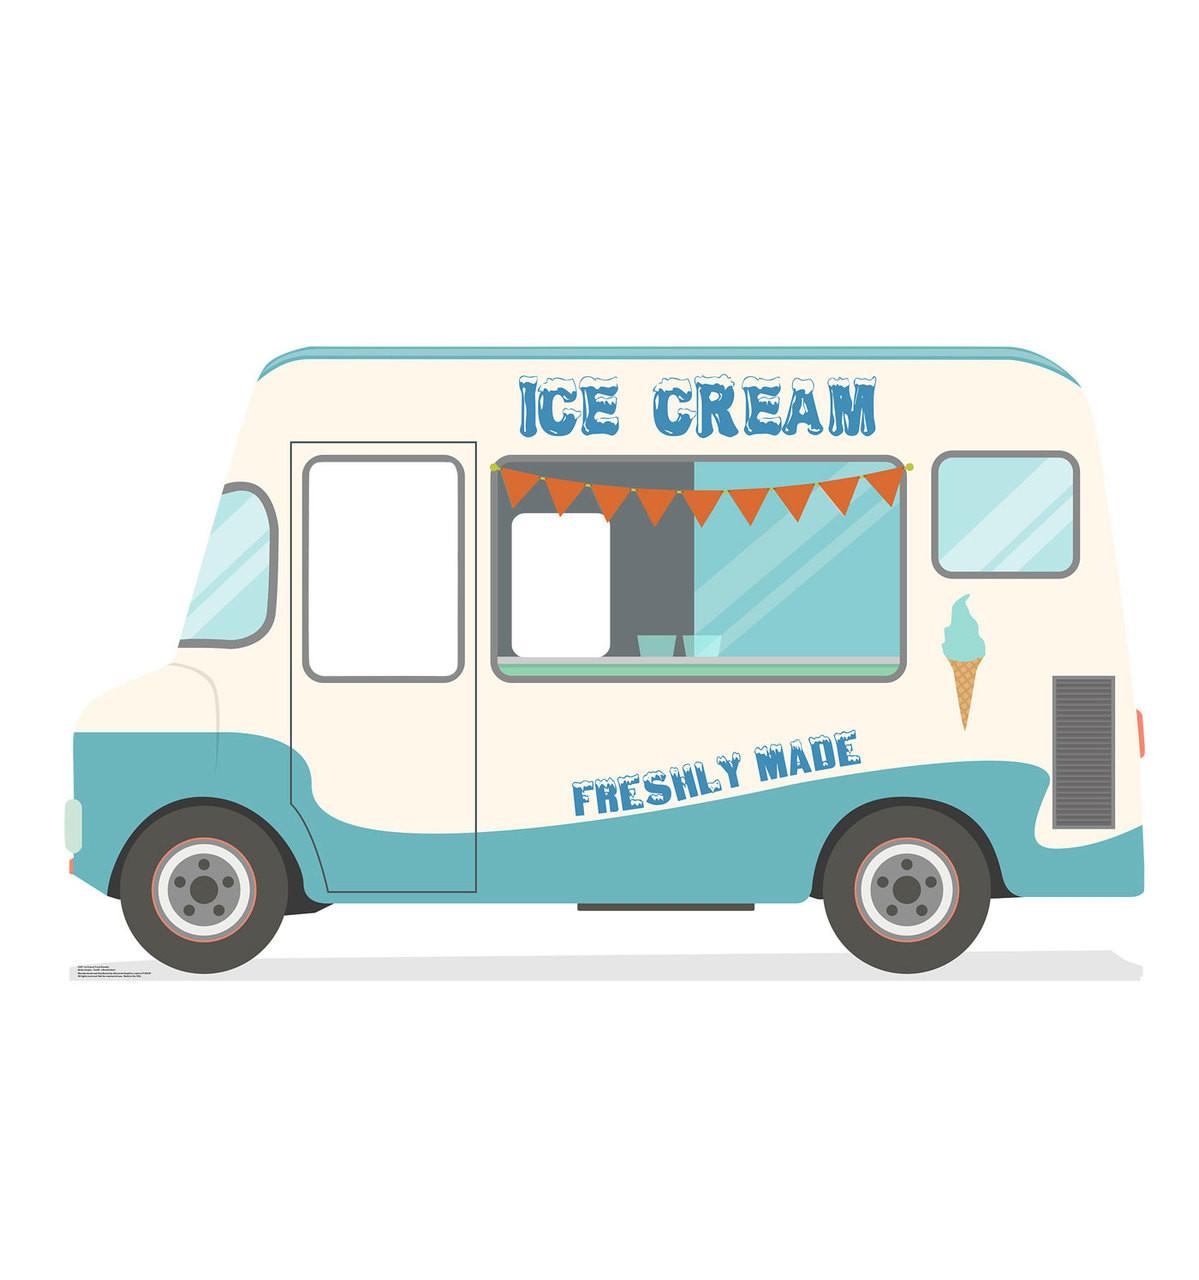 Life-size Ice Cream Truck Standin Cardboard Standup